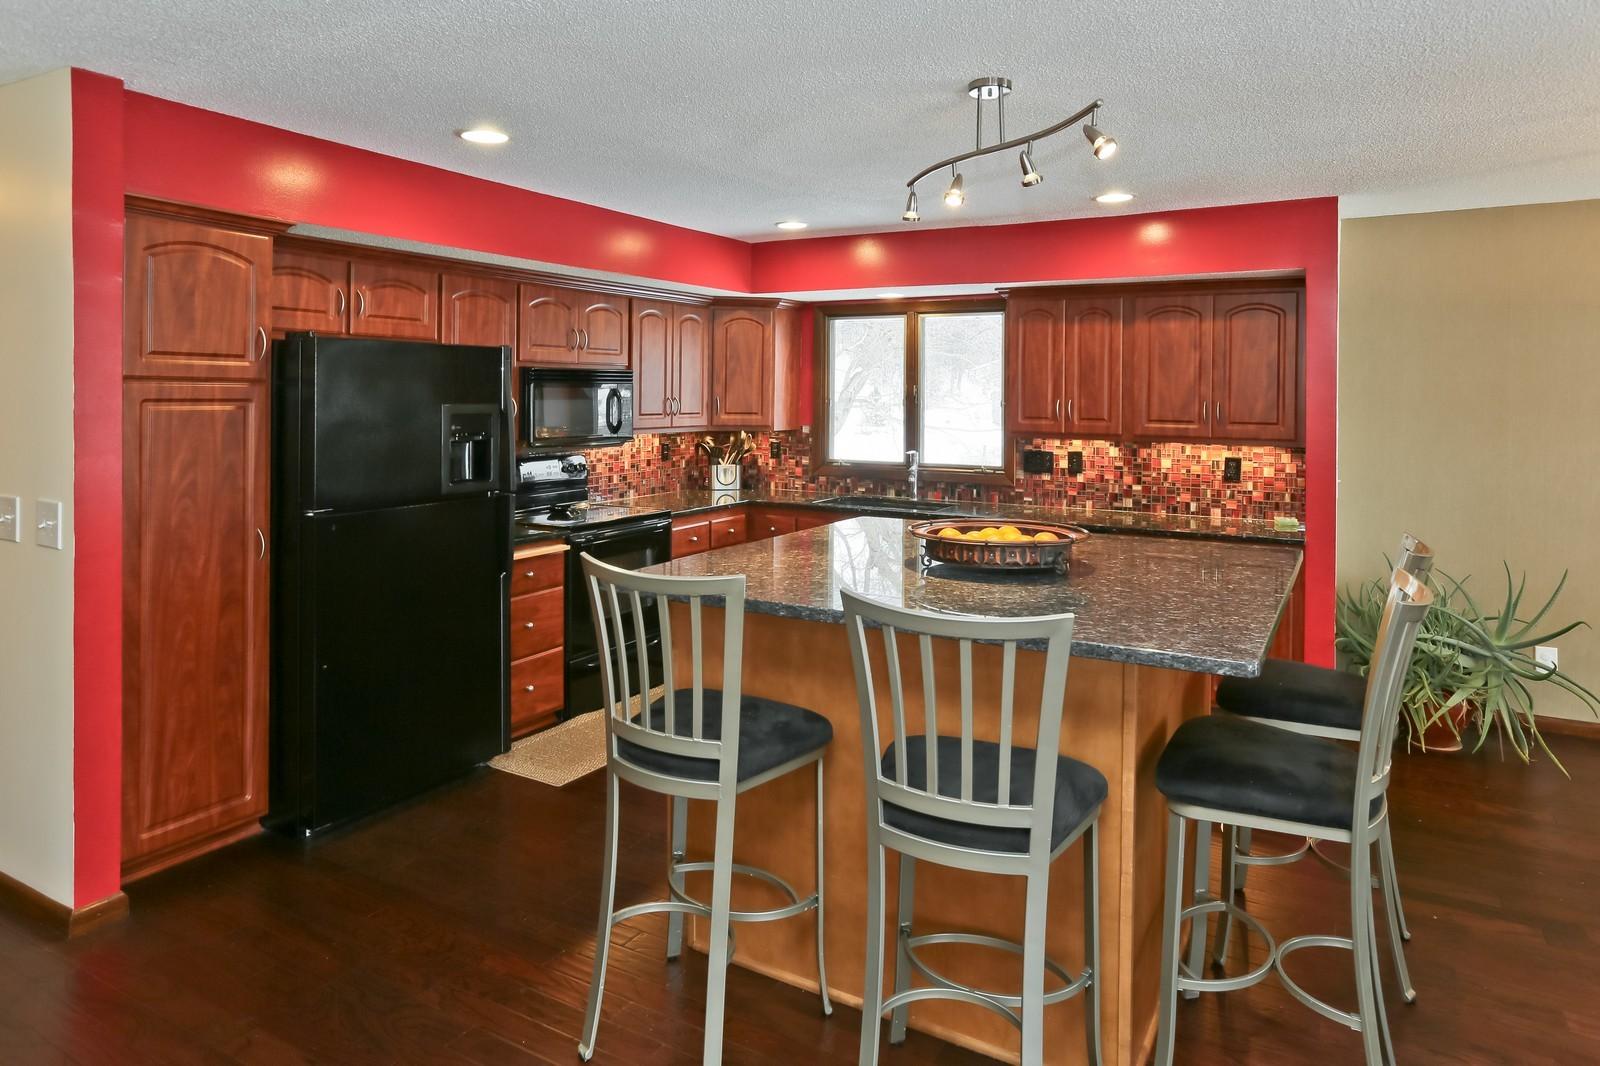 Real Estate Photography - 3250 Williams Lane, Minnetrista, MN, 55364 - Kitchen